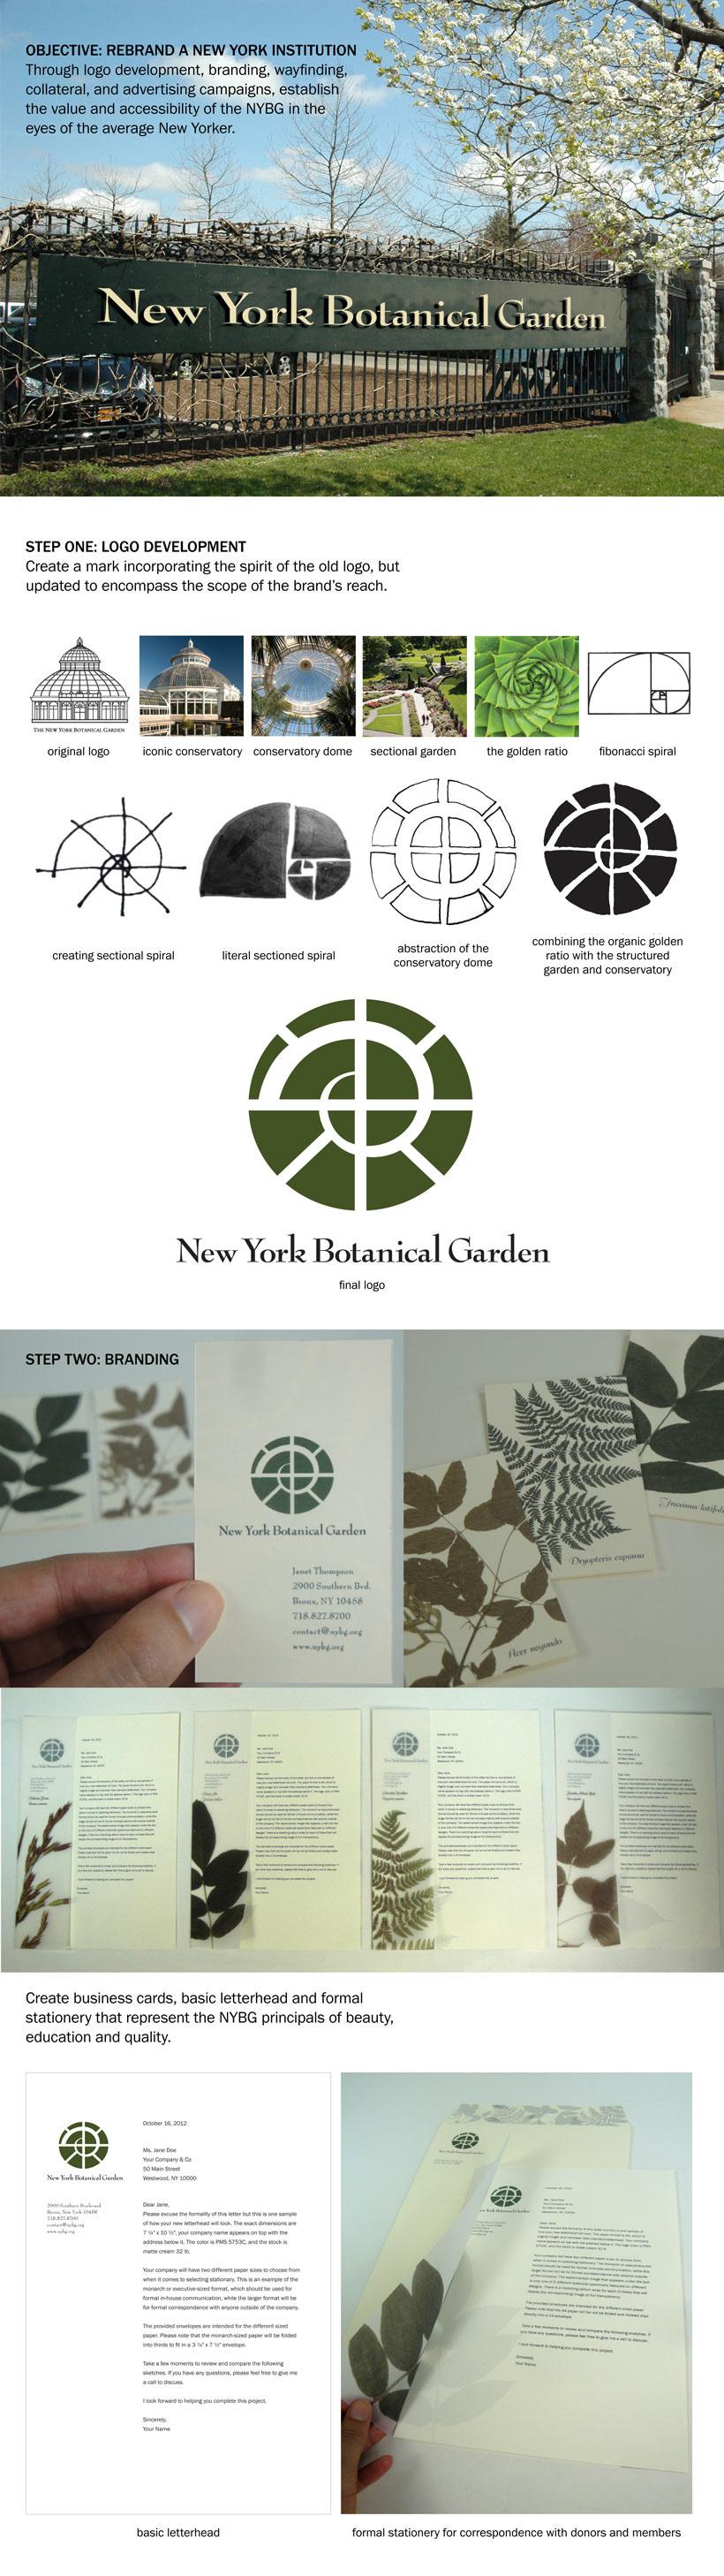 Nicolette Hayes - New York Botanical Garden